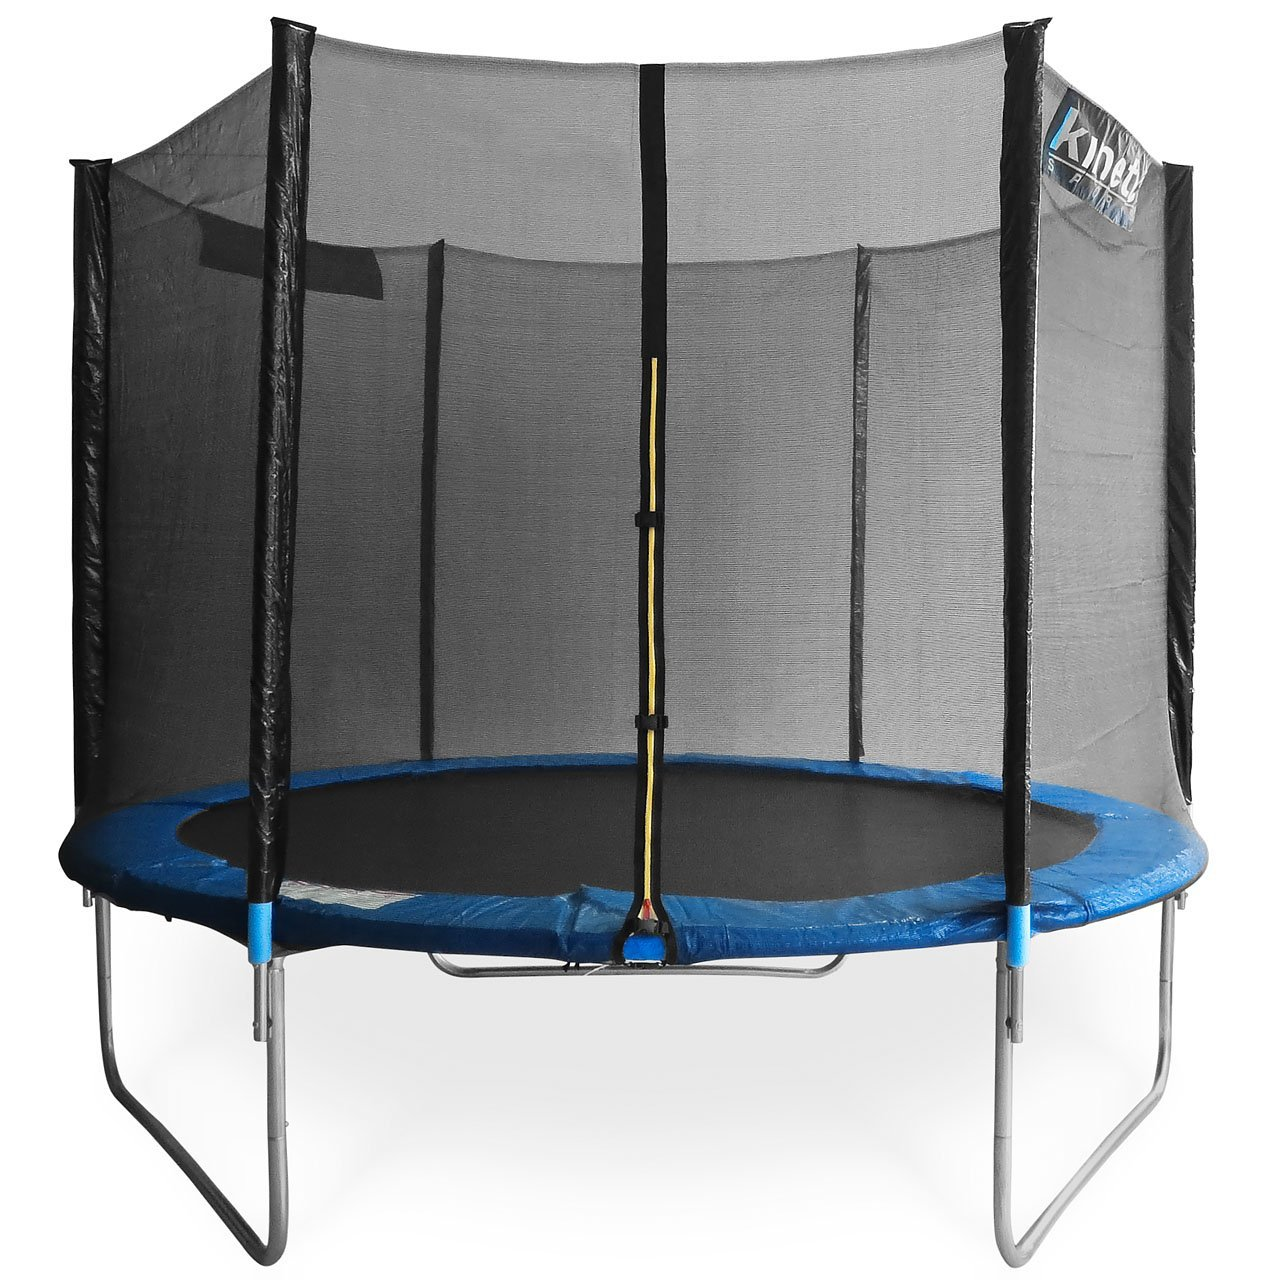 ii ii trampolin test aktuelle testsieger 2018 ansehen. Black Bedroom Furniture Sets. Home Design Ideas